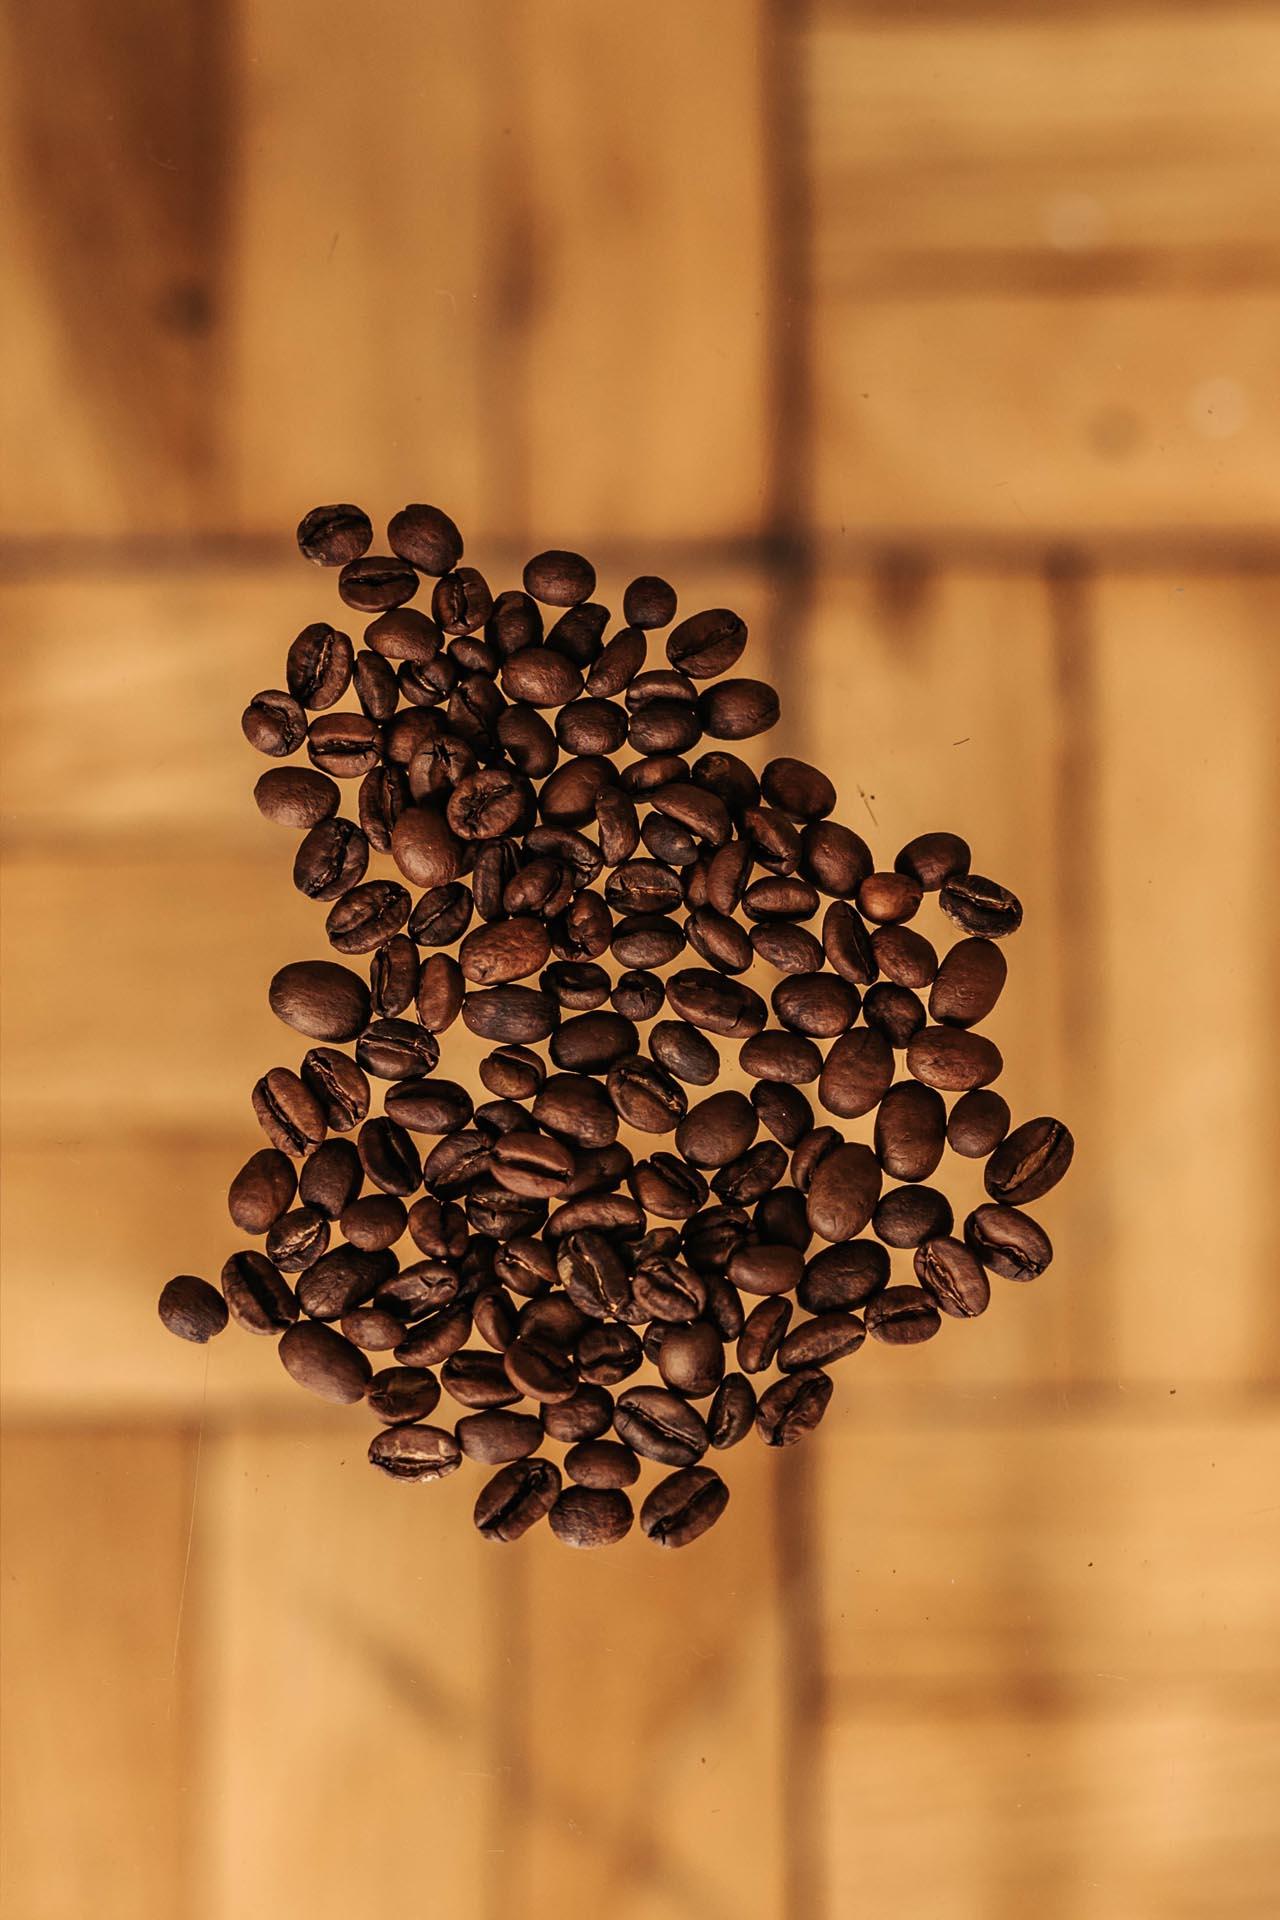 Kenco Decaffeinated Beans Lazy Days Coffee Company